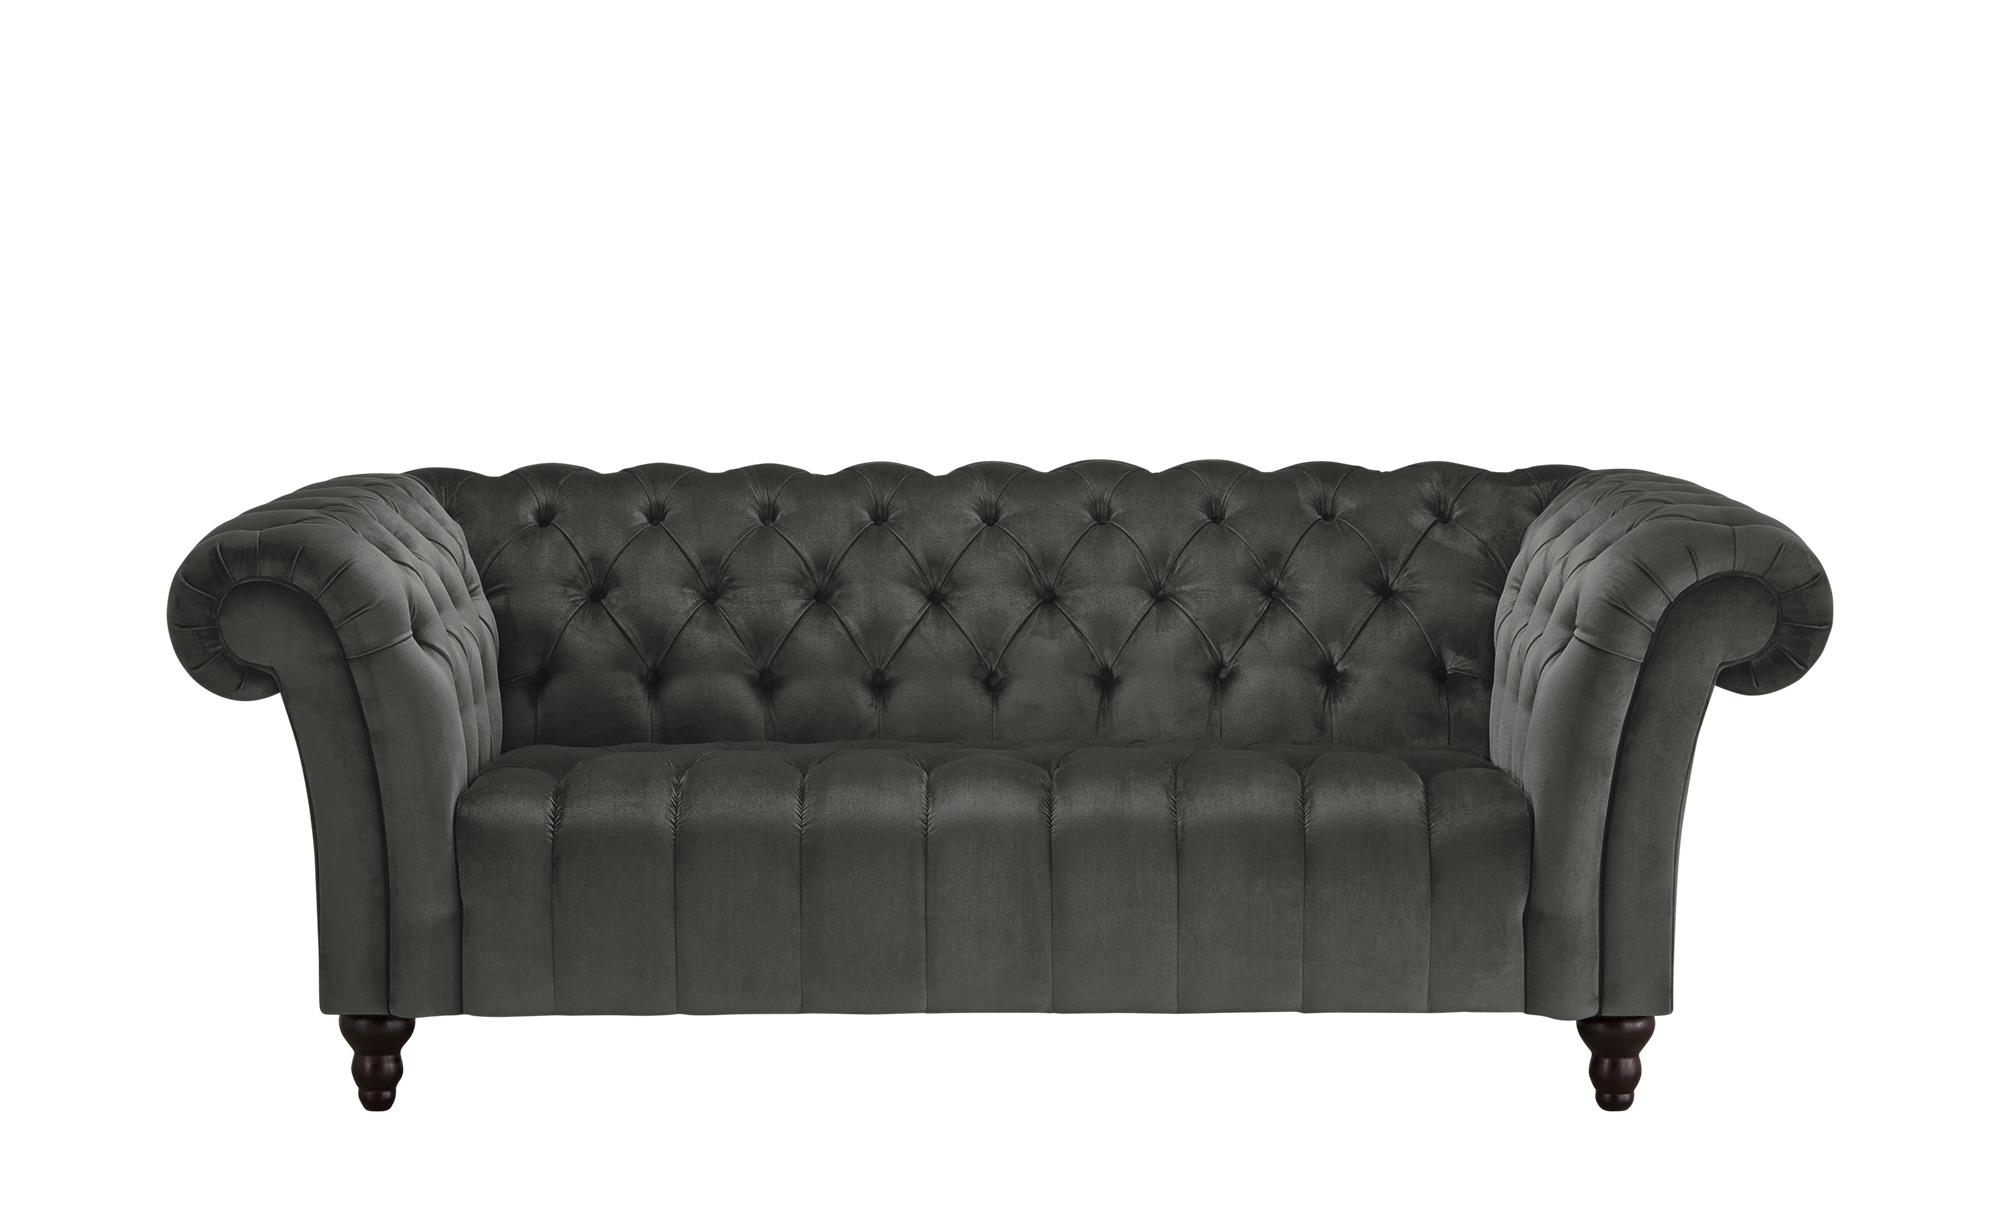 Sofa, 2-sitzig  Canyon ¦ grau ¦ Maße (cm): B: 205 H: 74 T: 101 Polstermöbel > Sofas > 2-Sitzer - Höffner